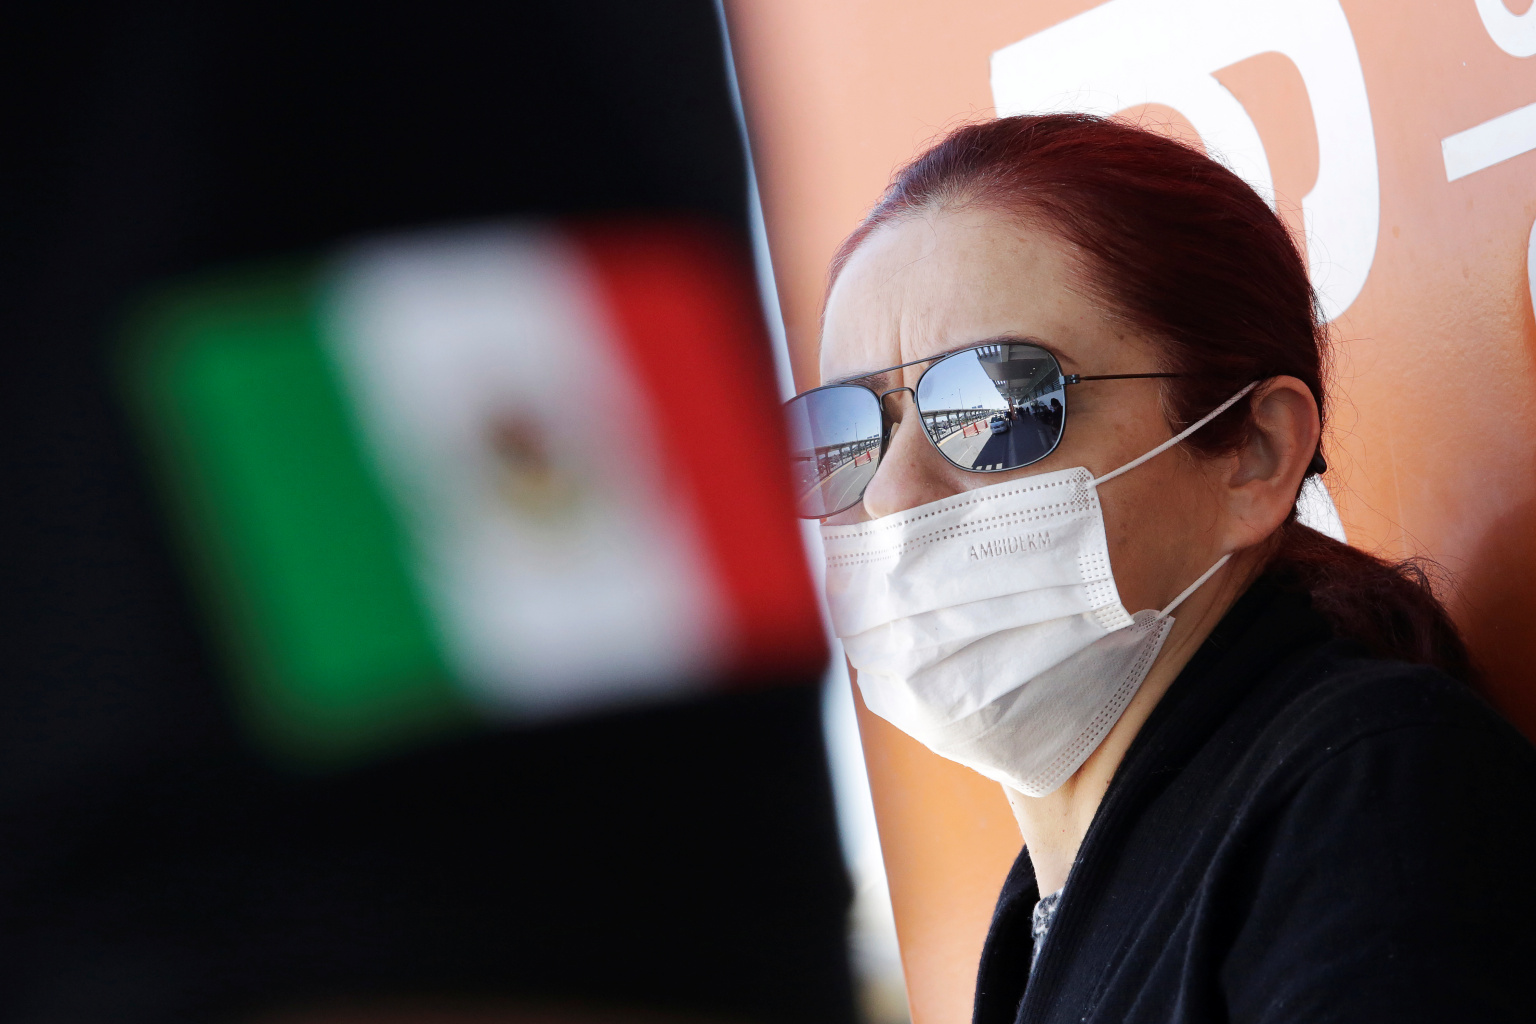 Мексика вышла на третье место в мире по количеству жертв COVID-19 - Фото